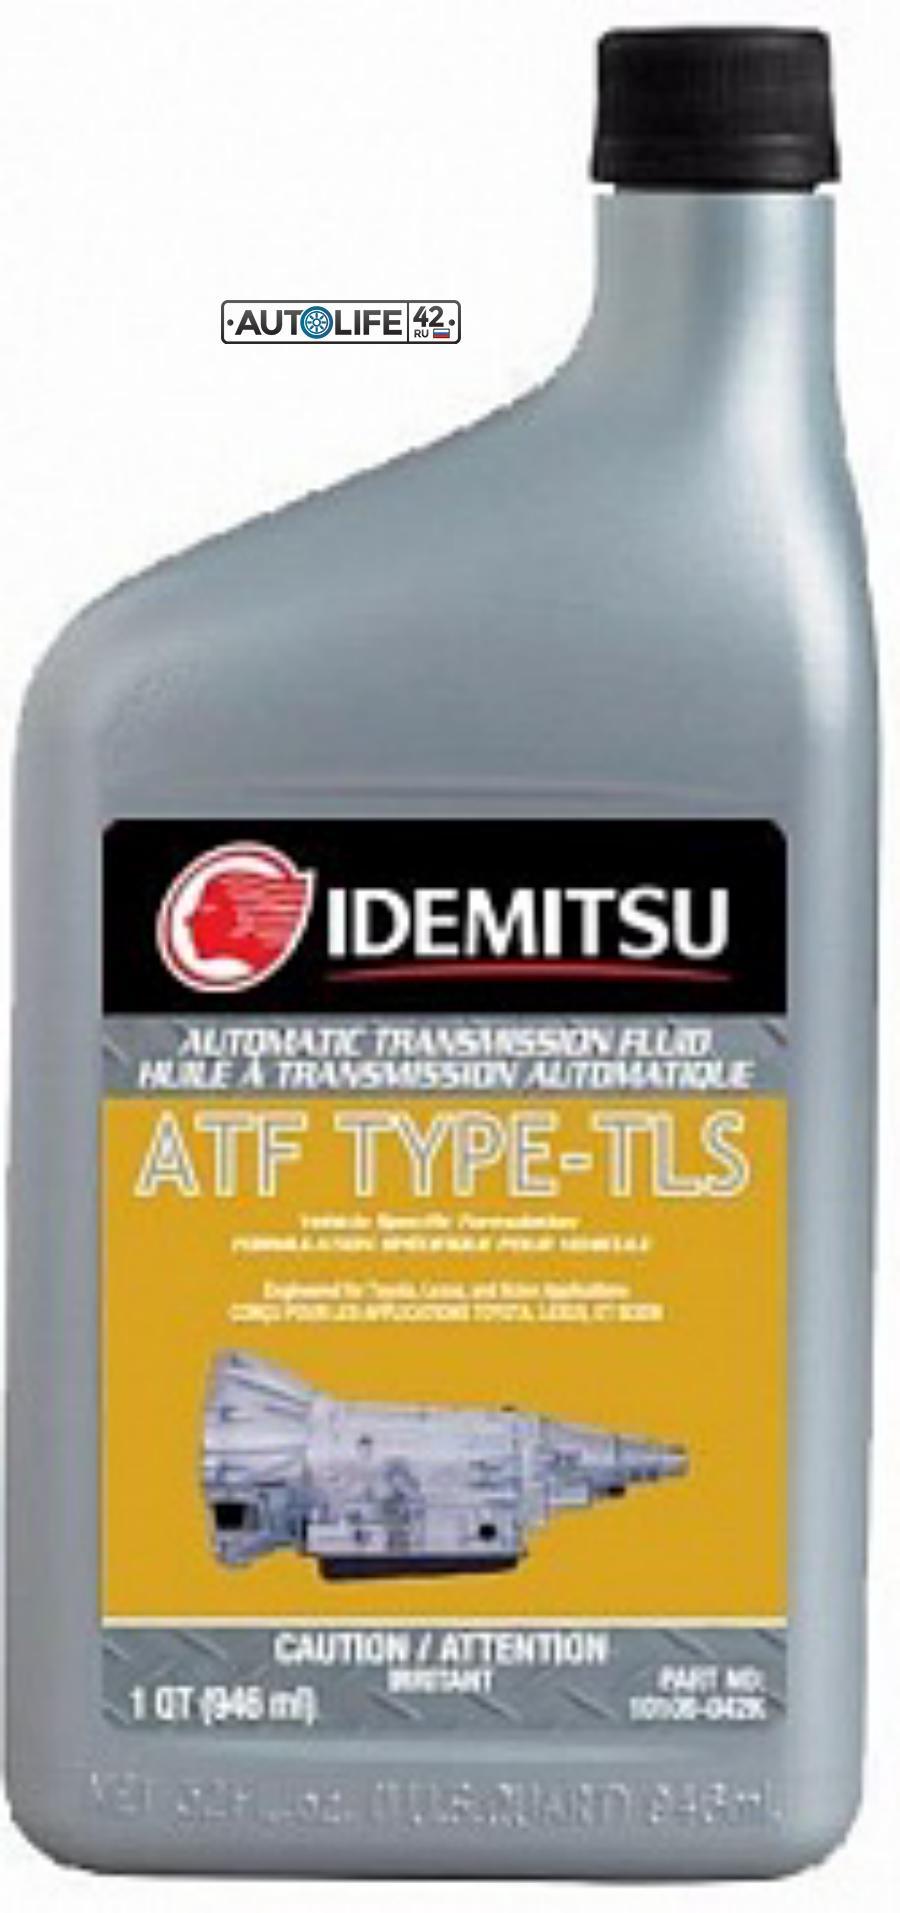 IDEMITSU ATF TYPE TLS/ Жидкость для АКПП (946мл.) IDEMITSU 10106042K